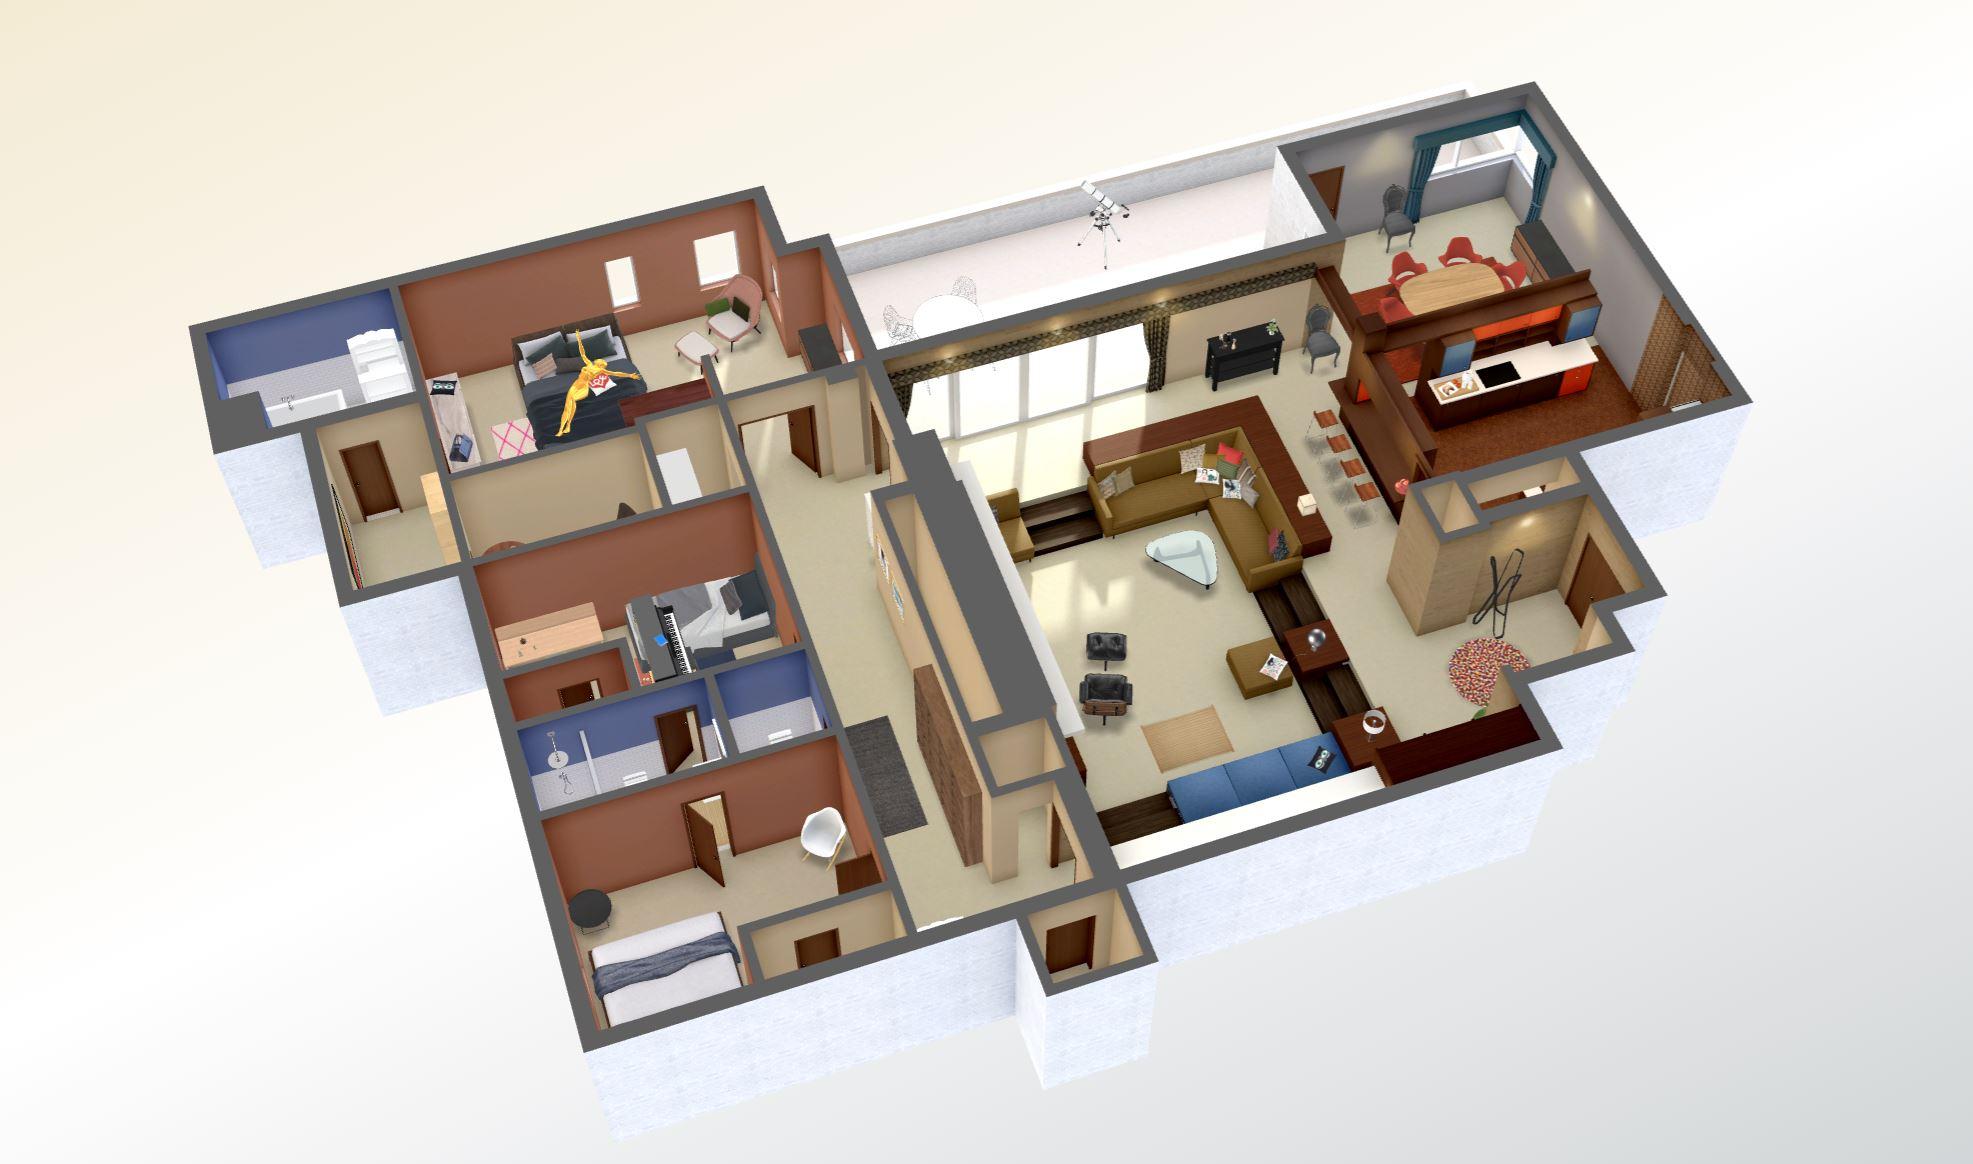 Explore Don Draper's apartment in 3D